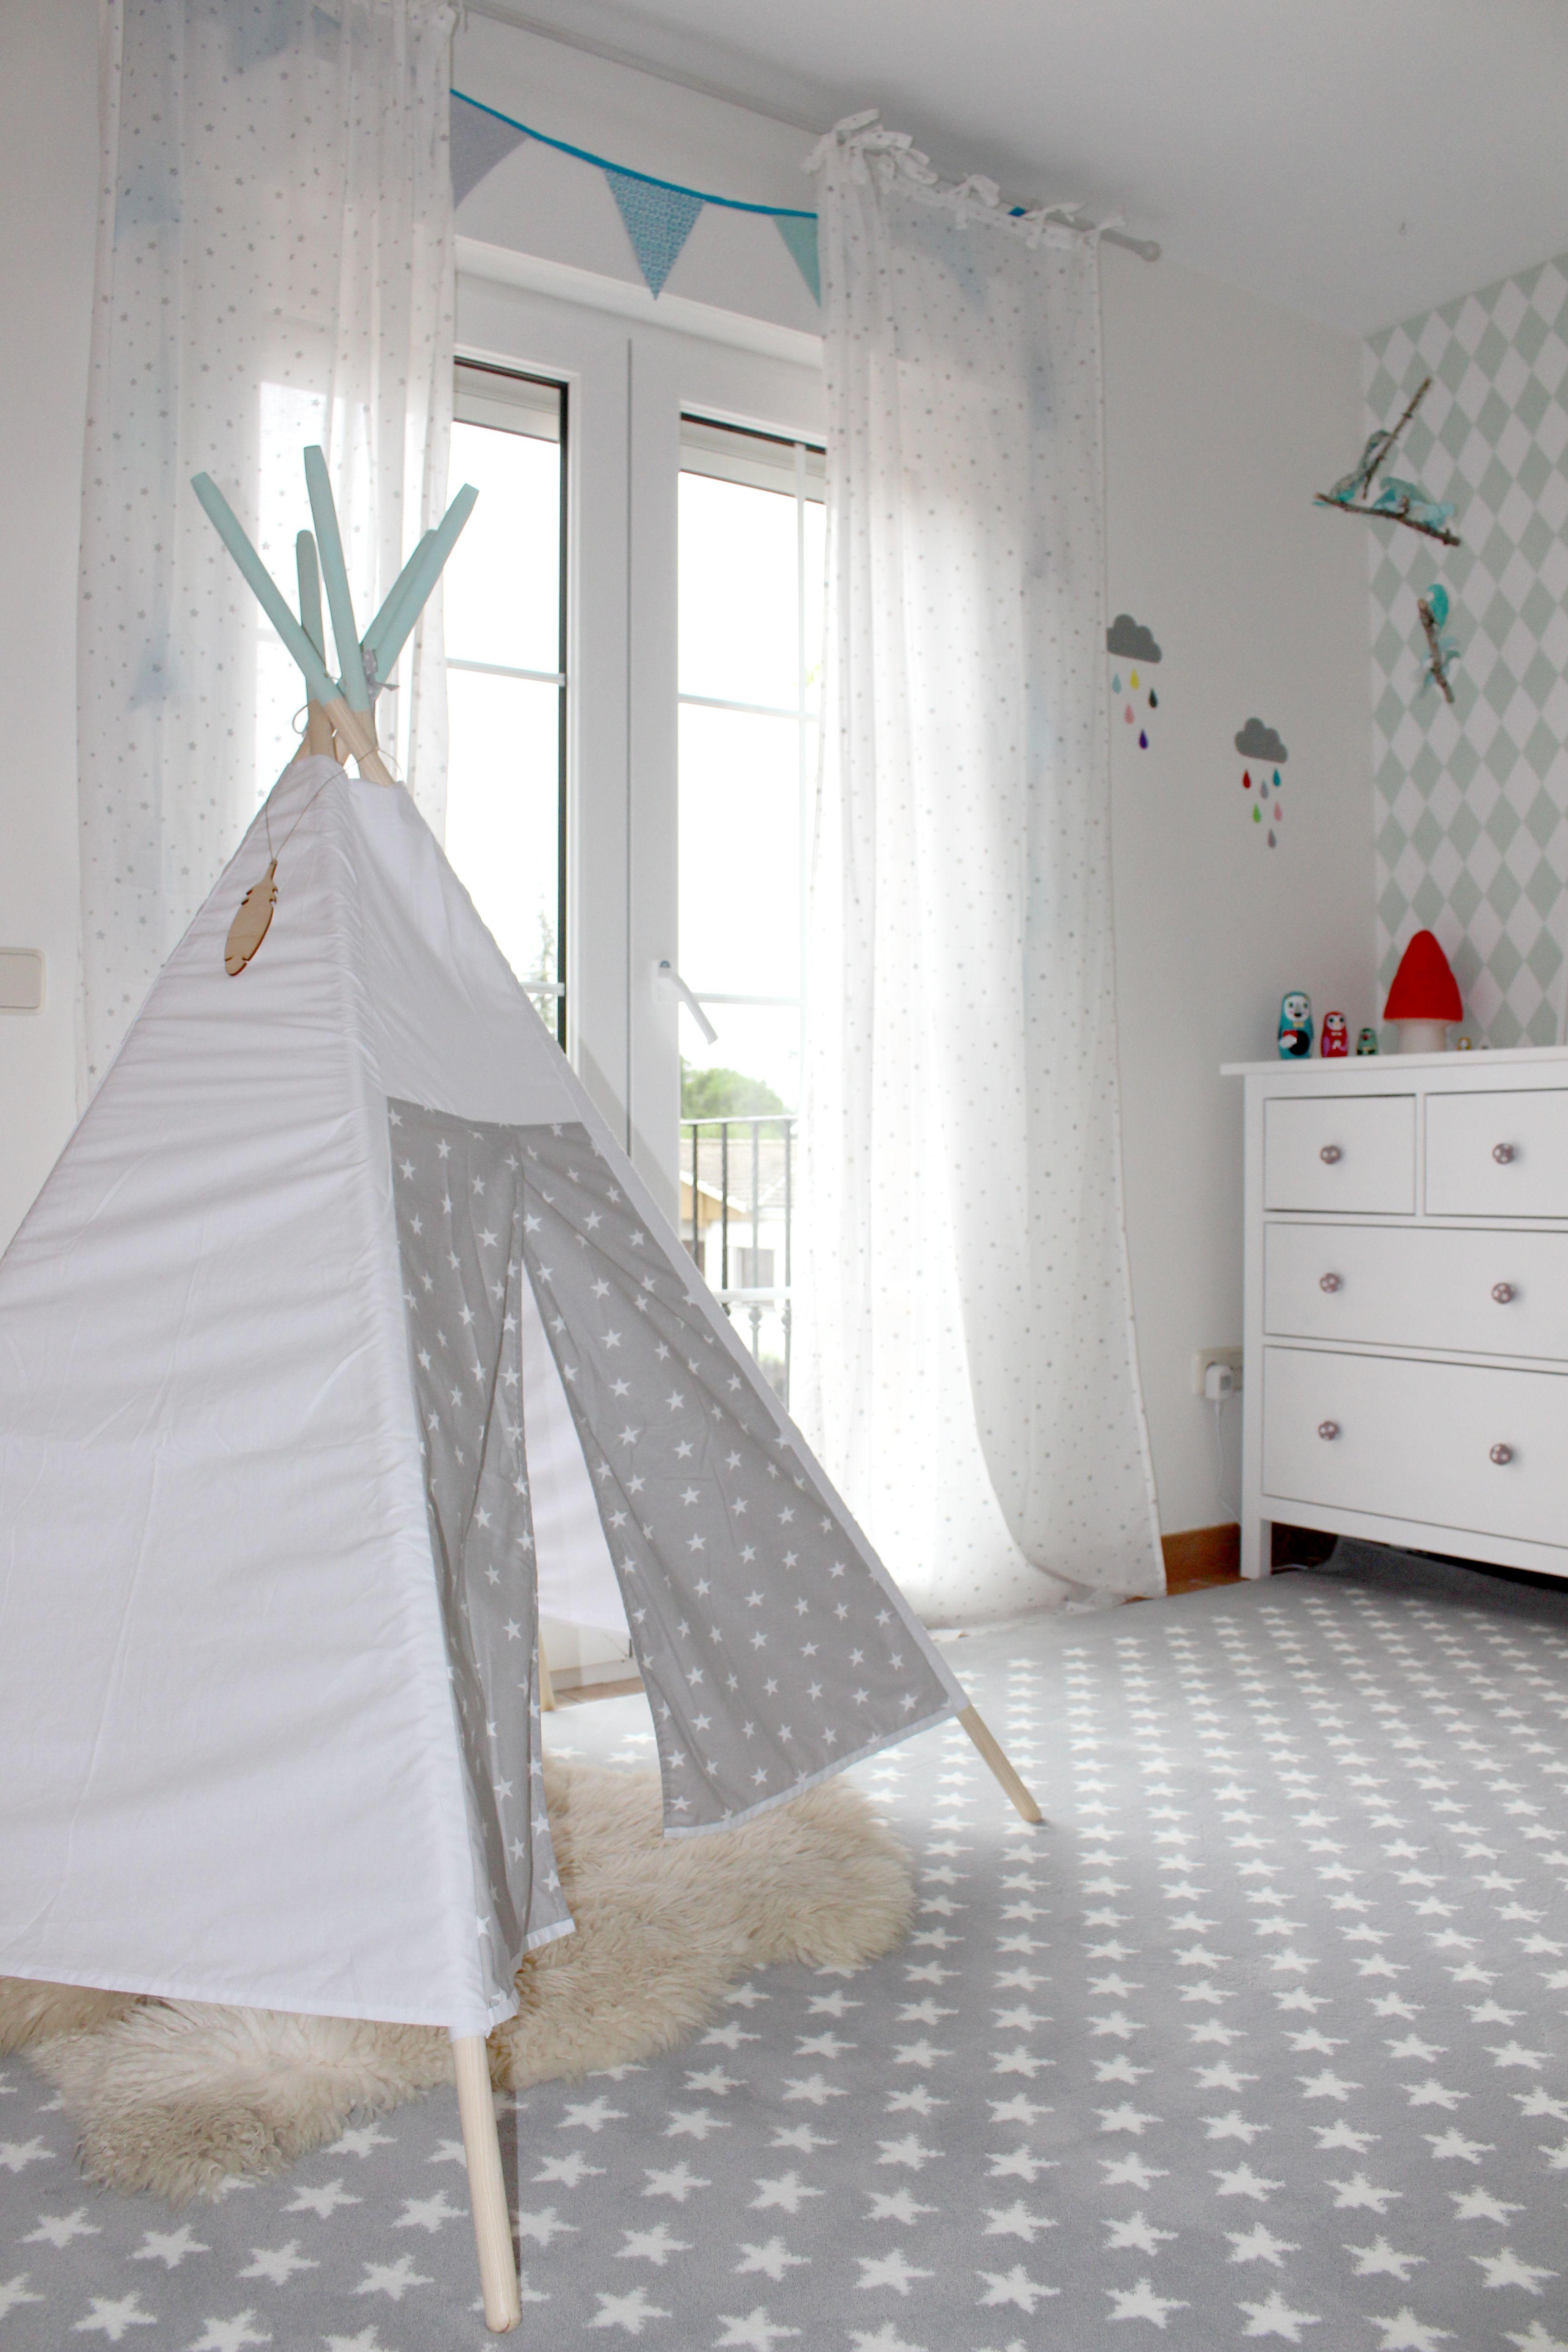 alfombra acrílica estrellitas gris / stars grey acrylic rug | my